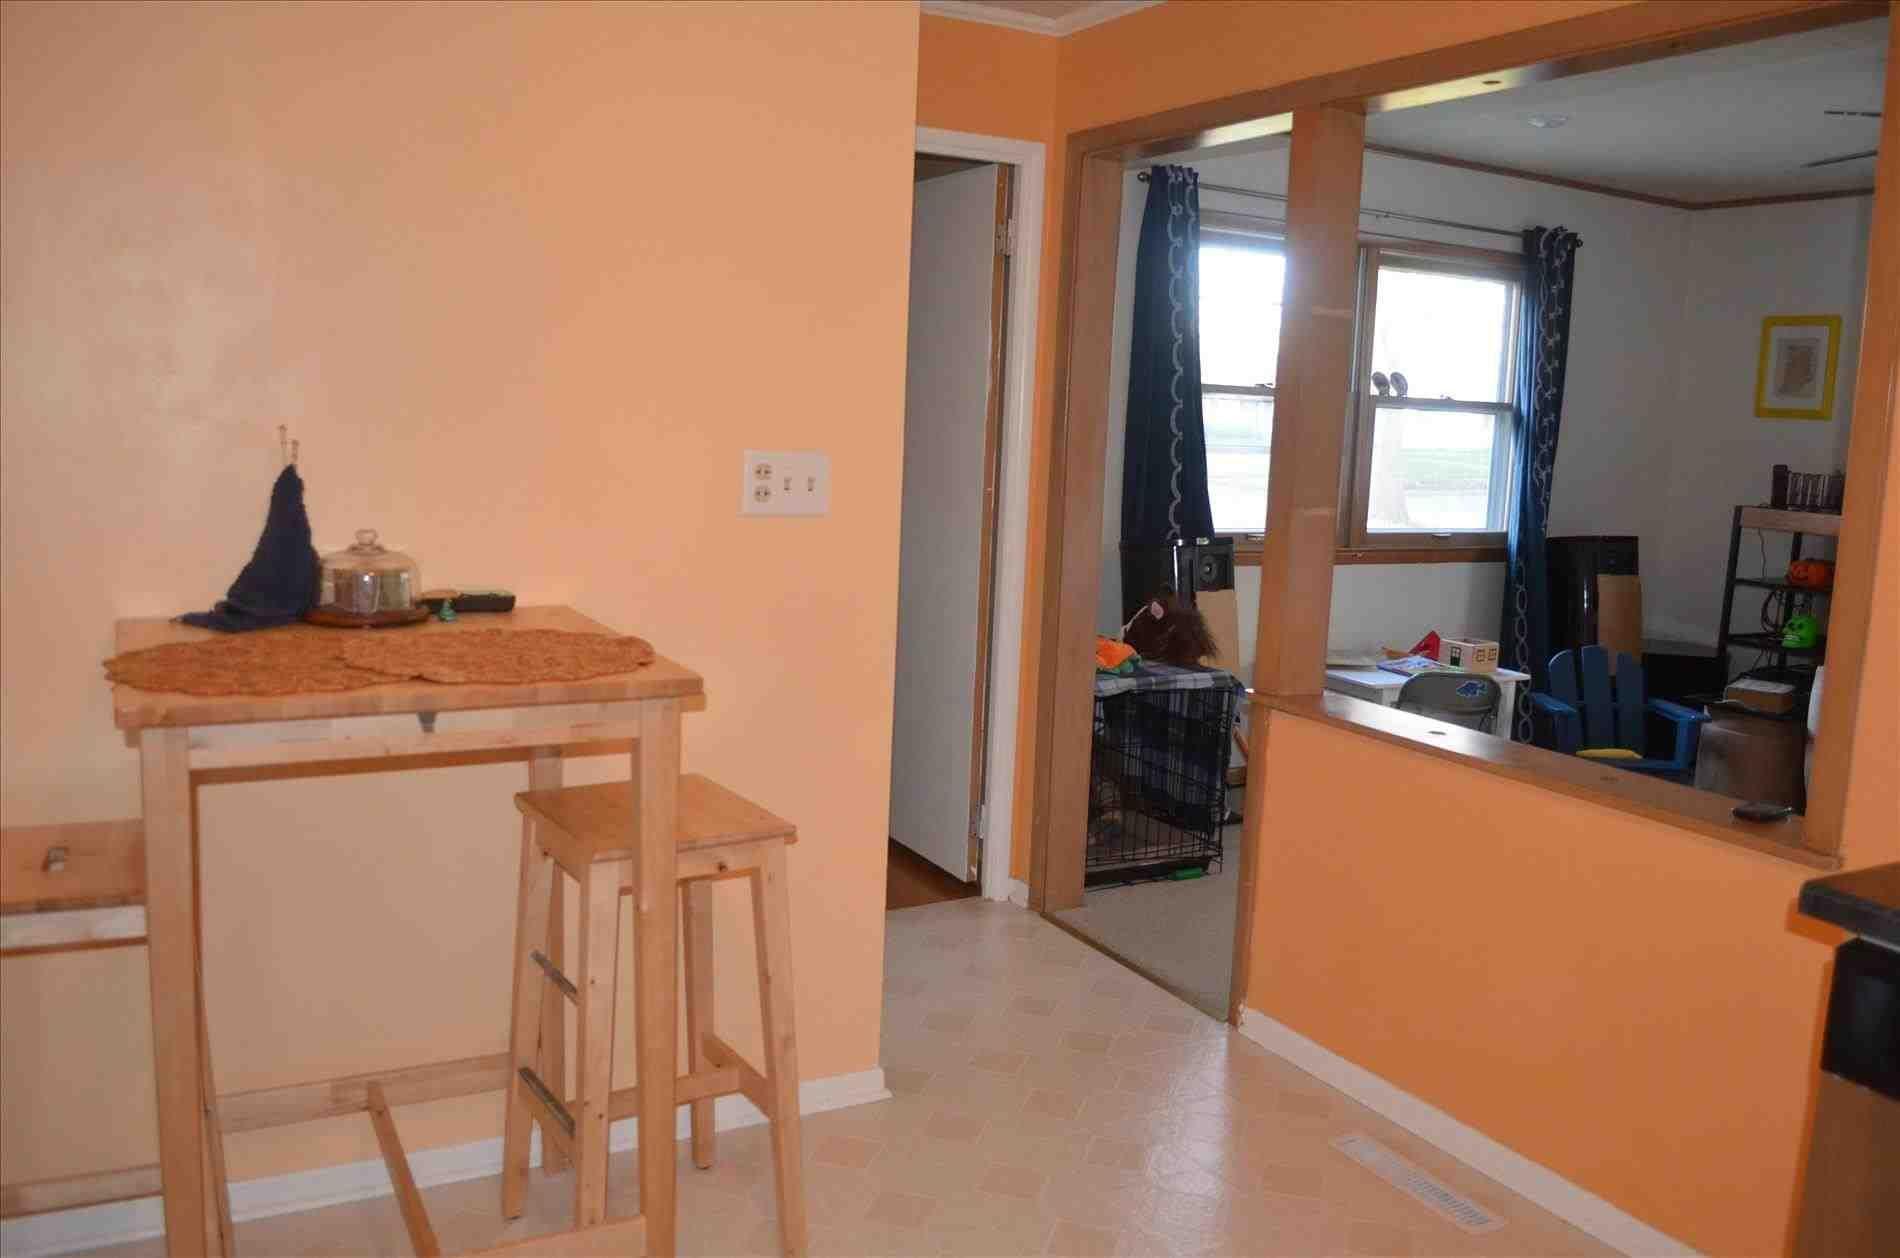 Paint Apartment Cool Bedroom Ideas To Upgrade Room Design Studio